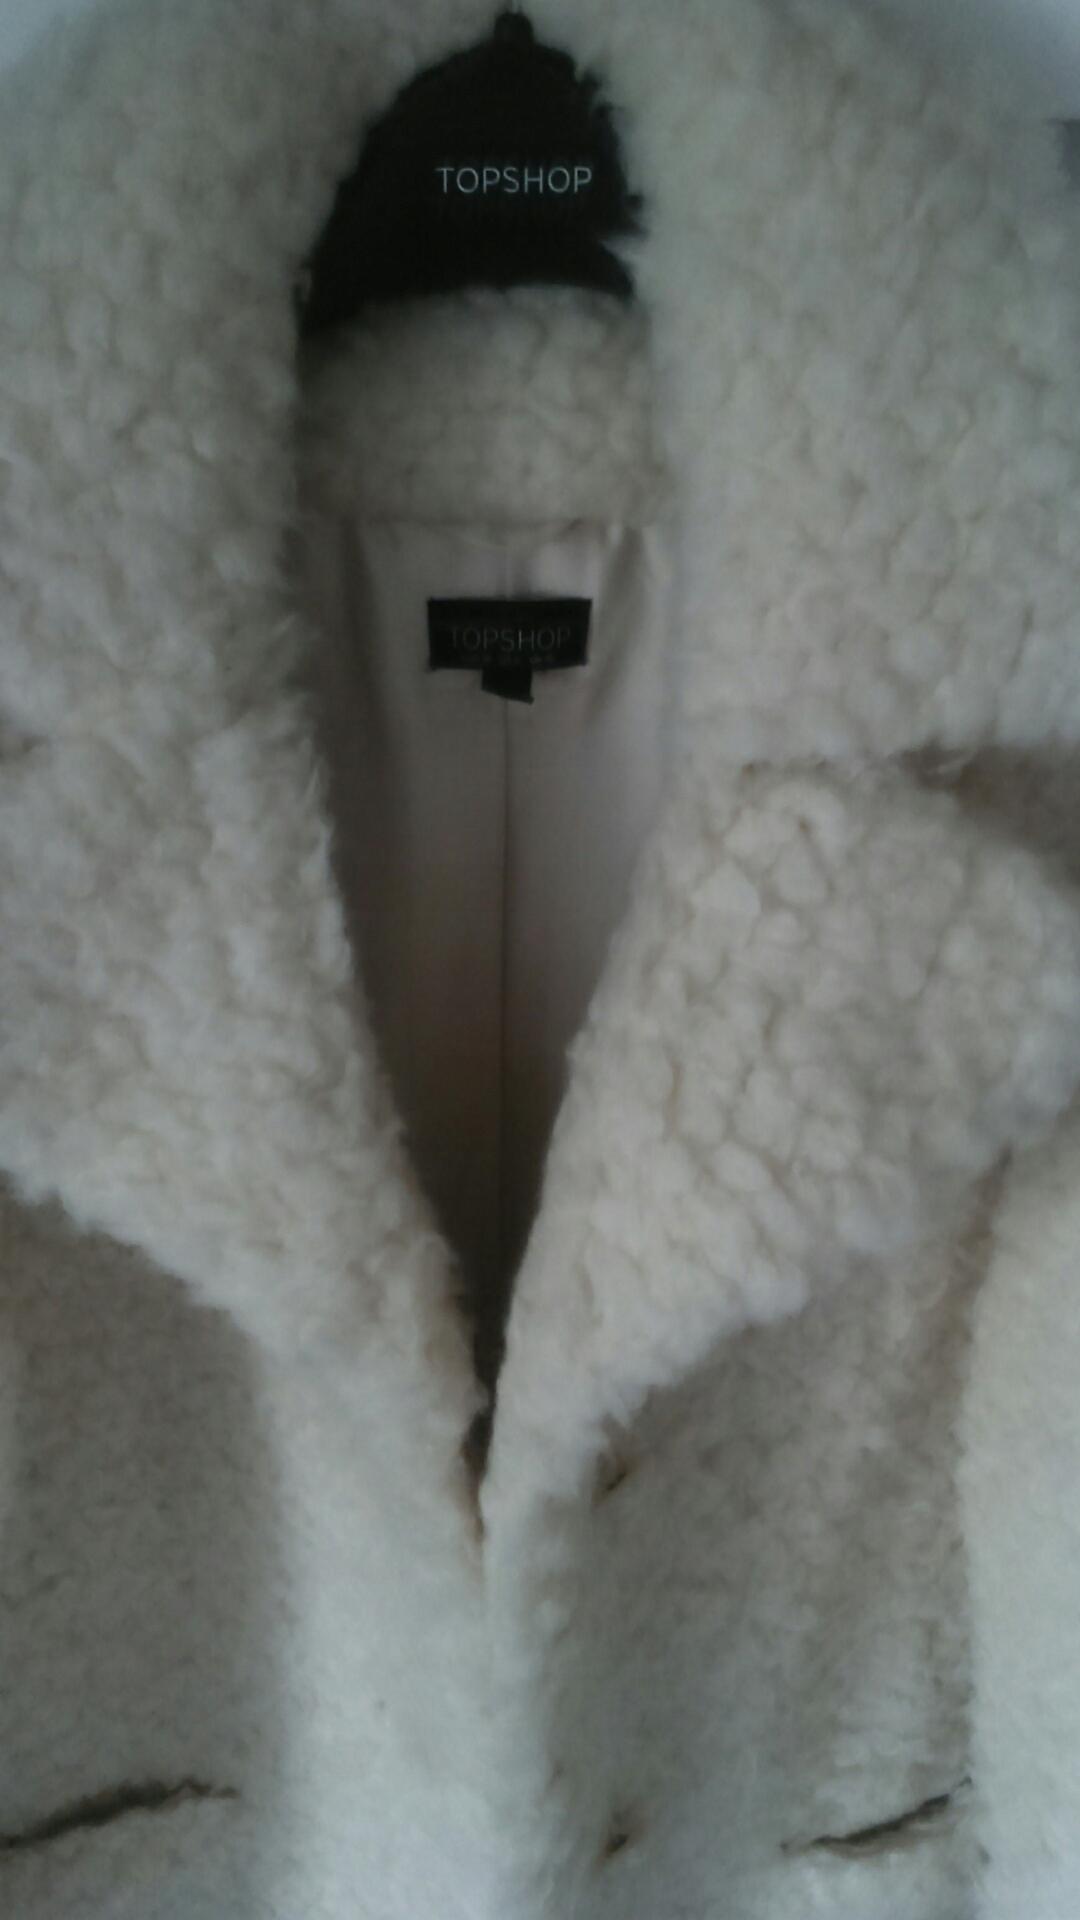 Kożuszek baranek płaszcz ecru TOPSHOP M 38 blog